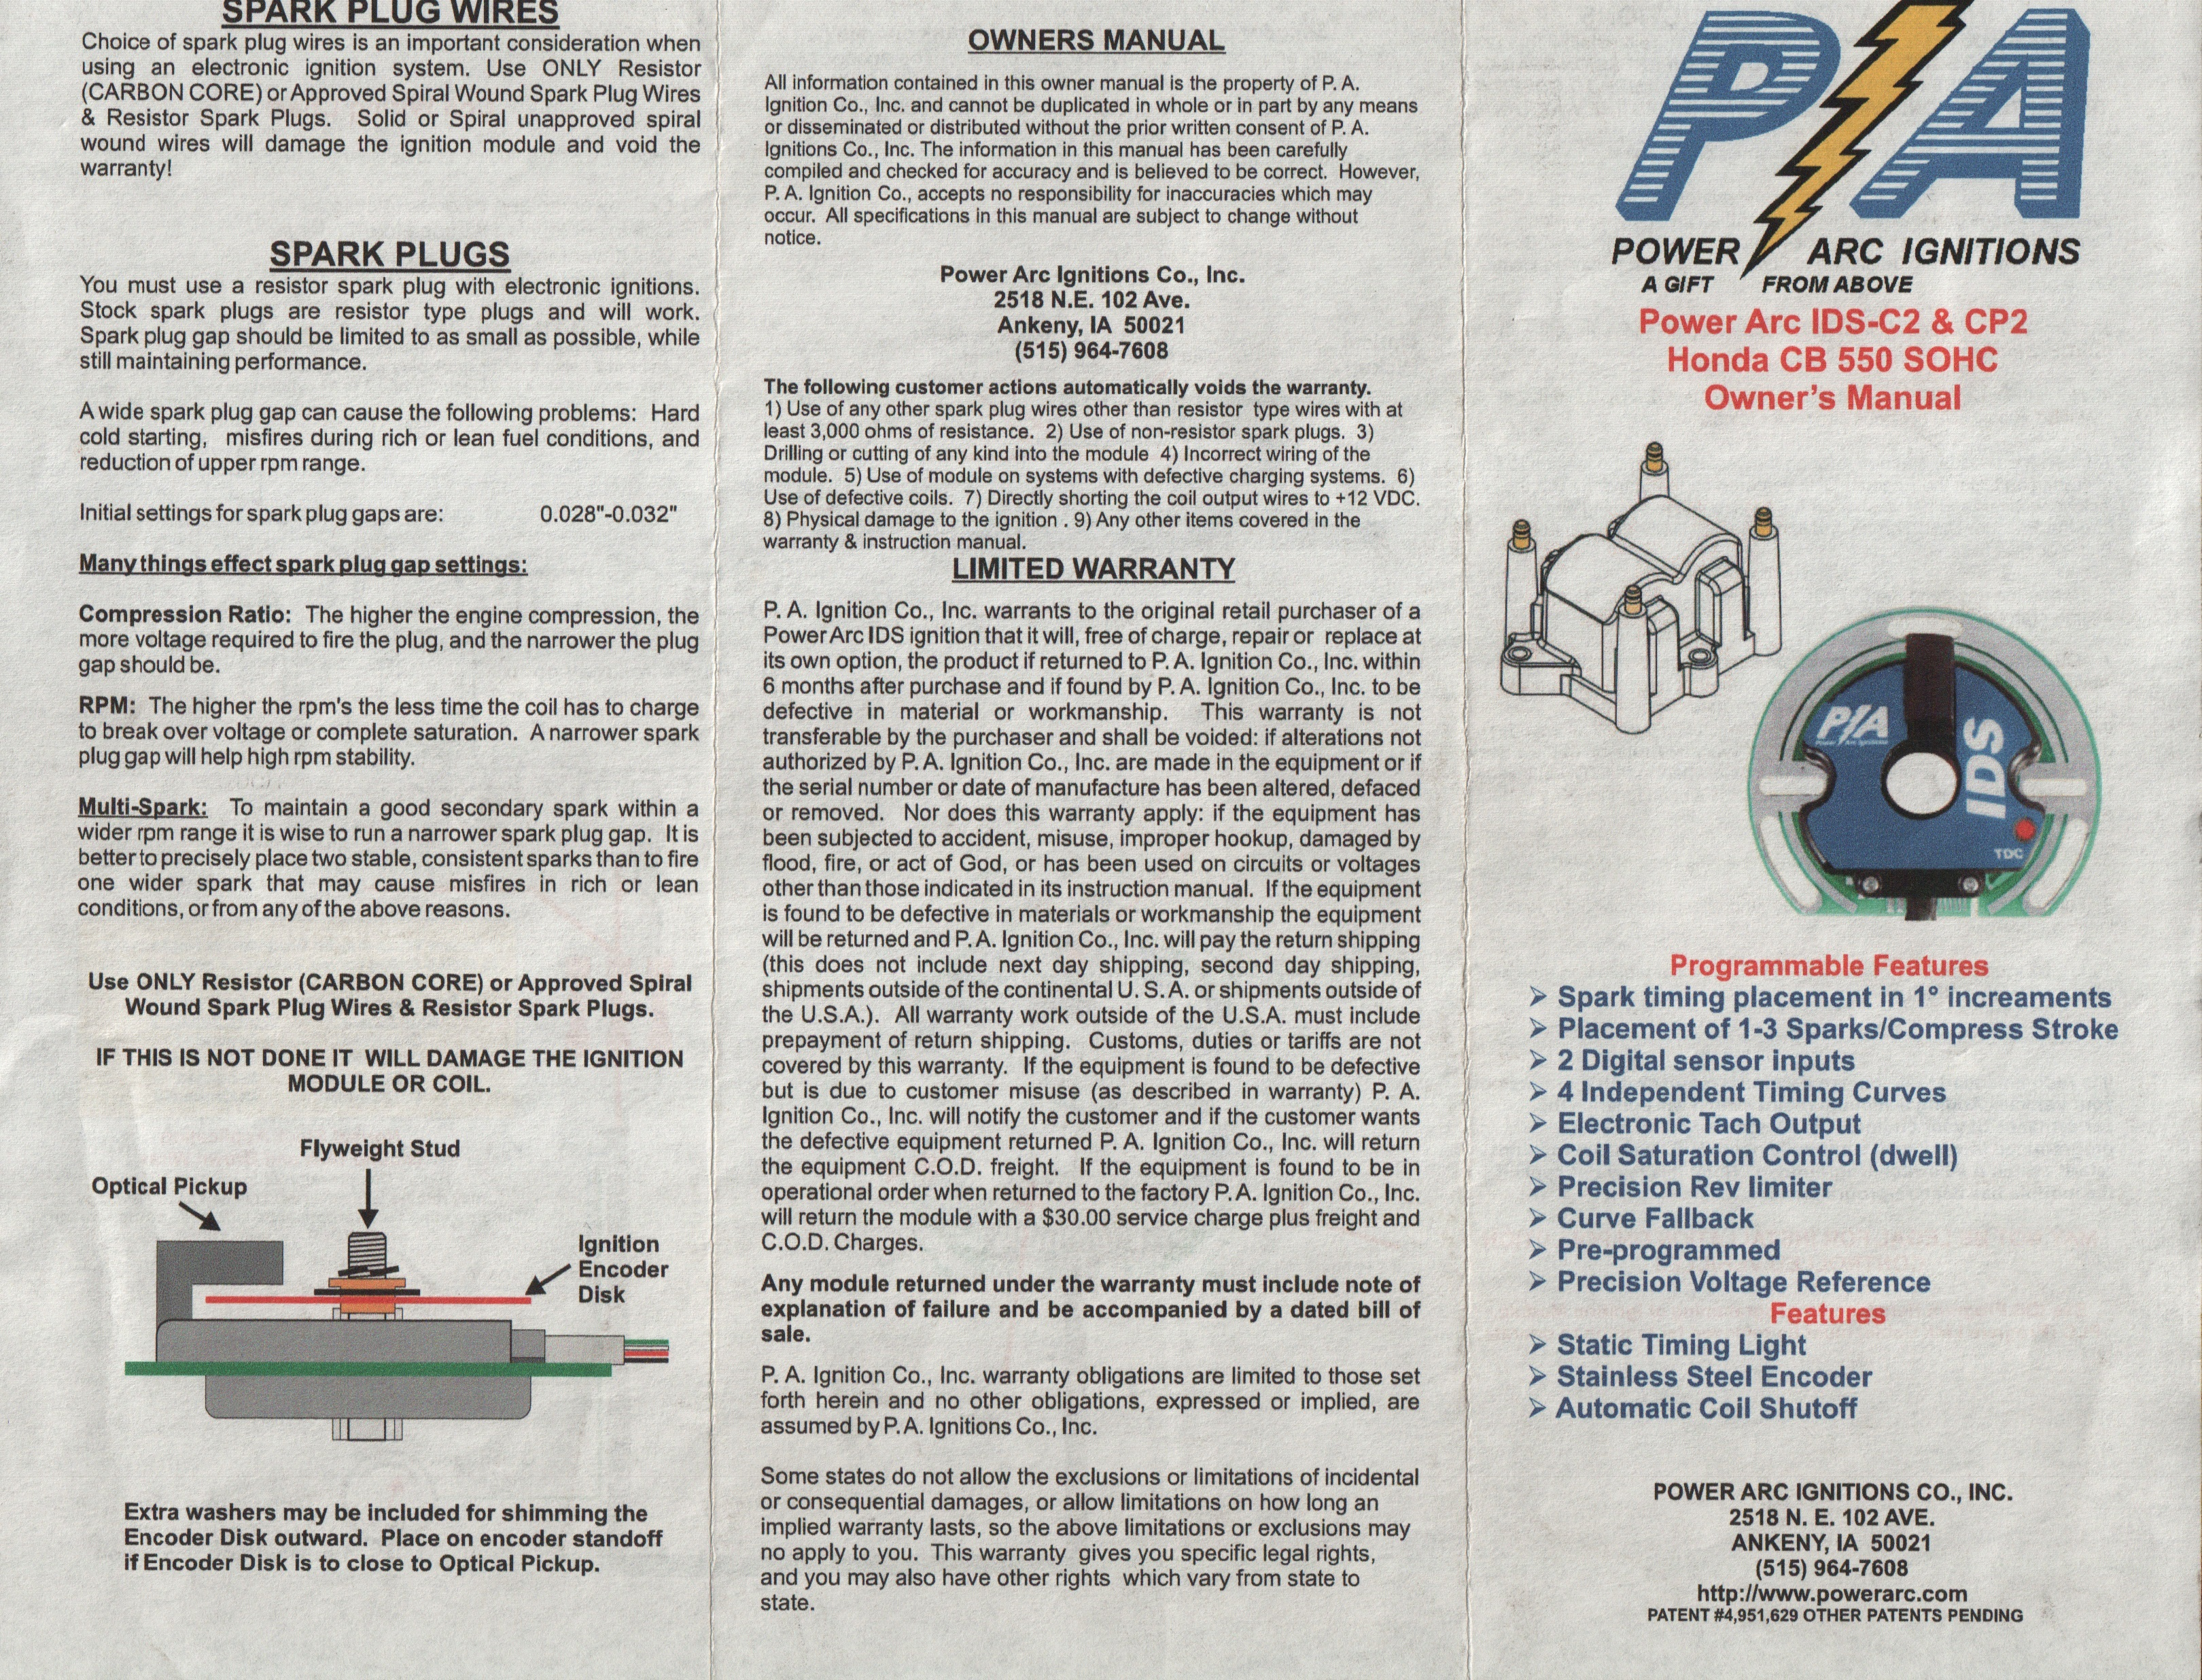 Power Arc Ignition Wiring Diagram Library Sohc Cb550